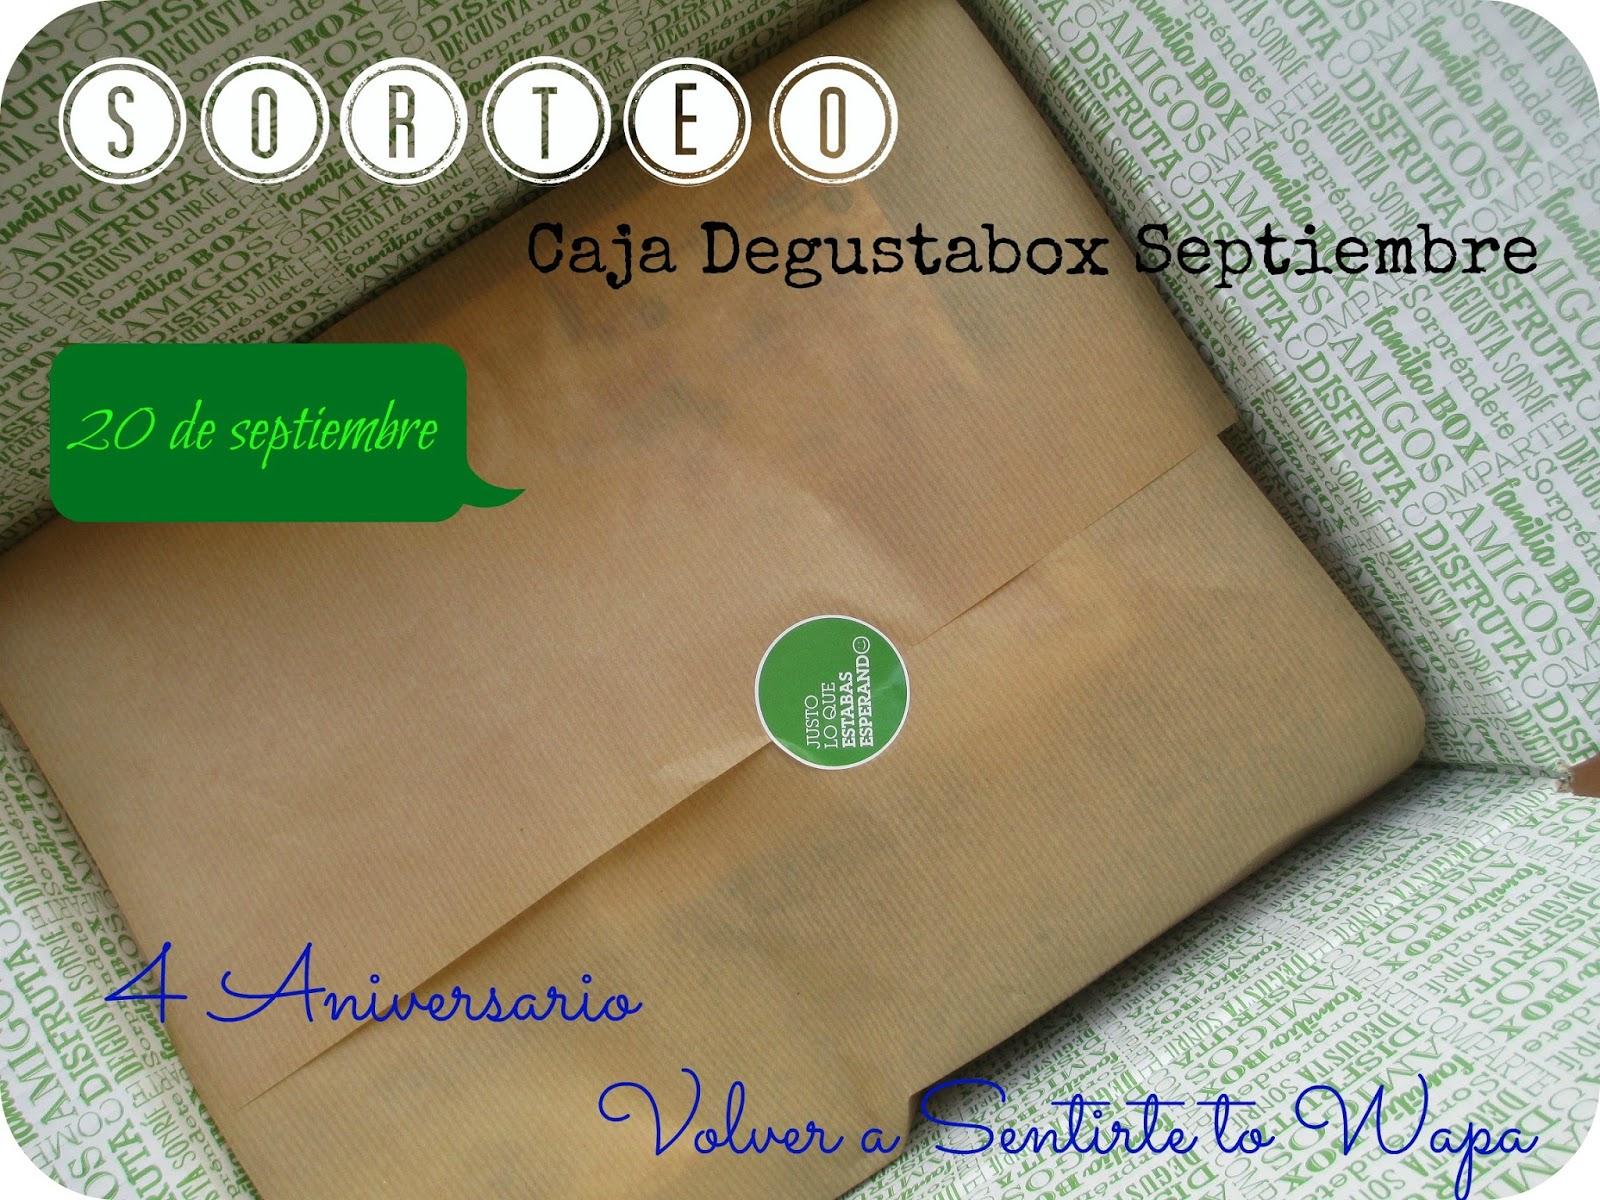 Sorteo Degustabox - Volver a Sentirte to Wapa